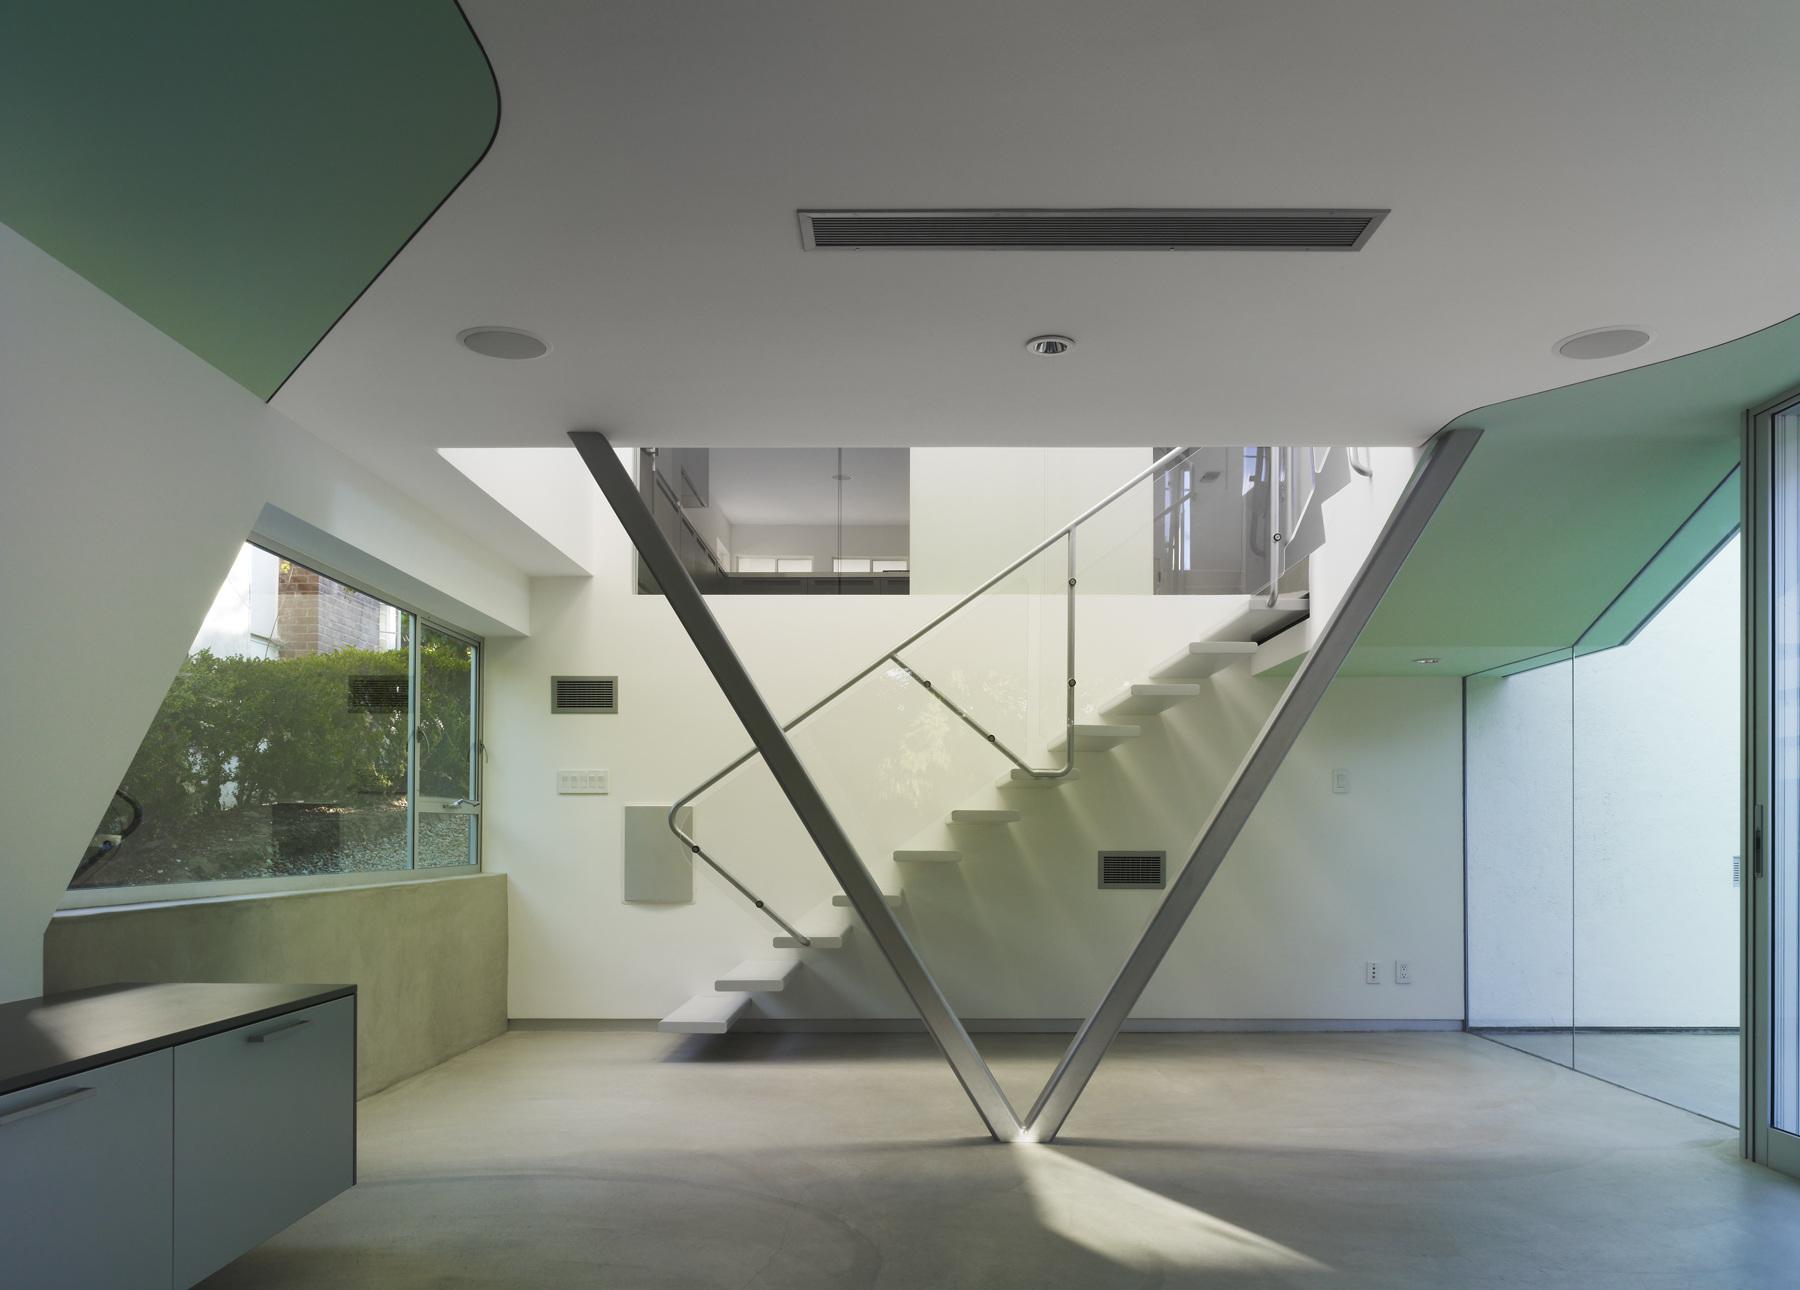 los angeles residence askin bas design studio